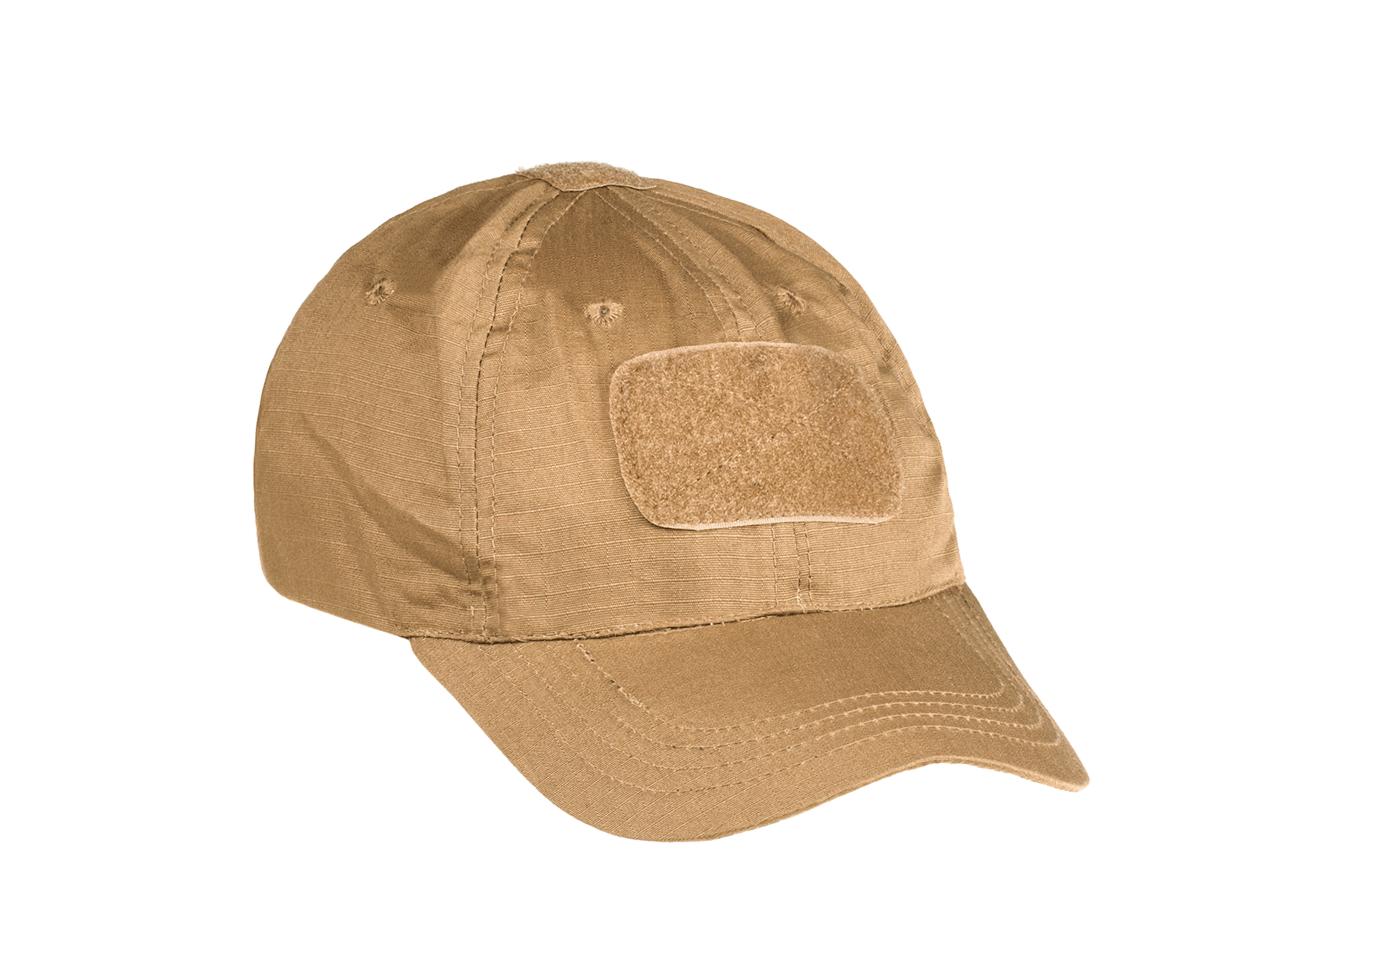 Baseball Cap Coyote - Caps - Headwear - Garments - invadergear.ch Online  shop 2690235fecca